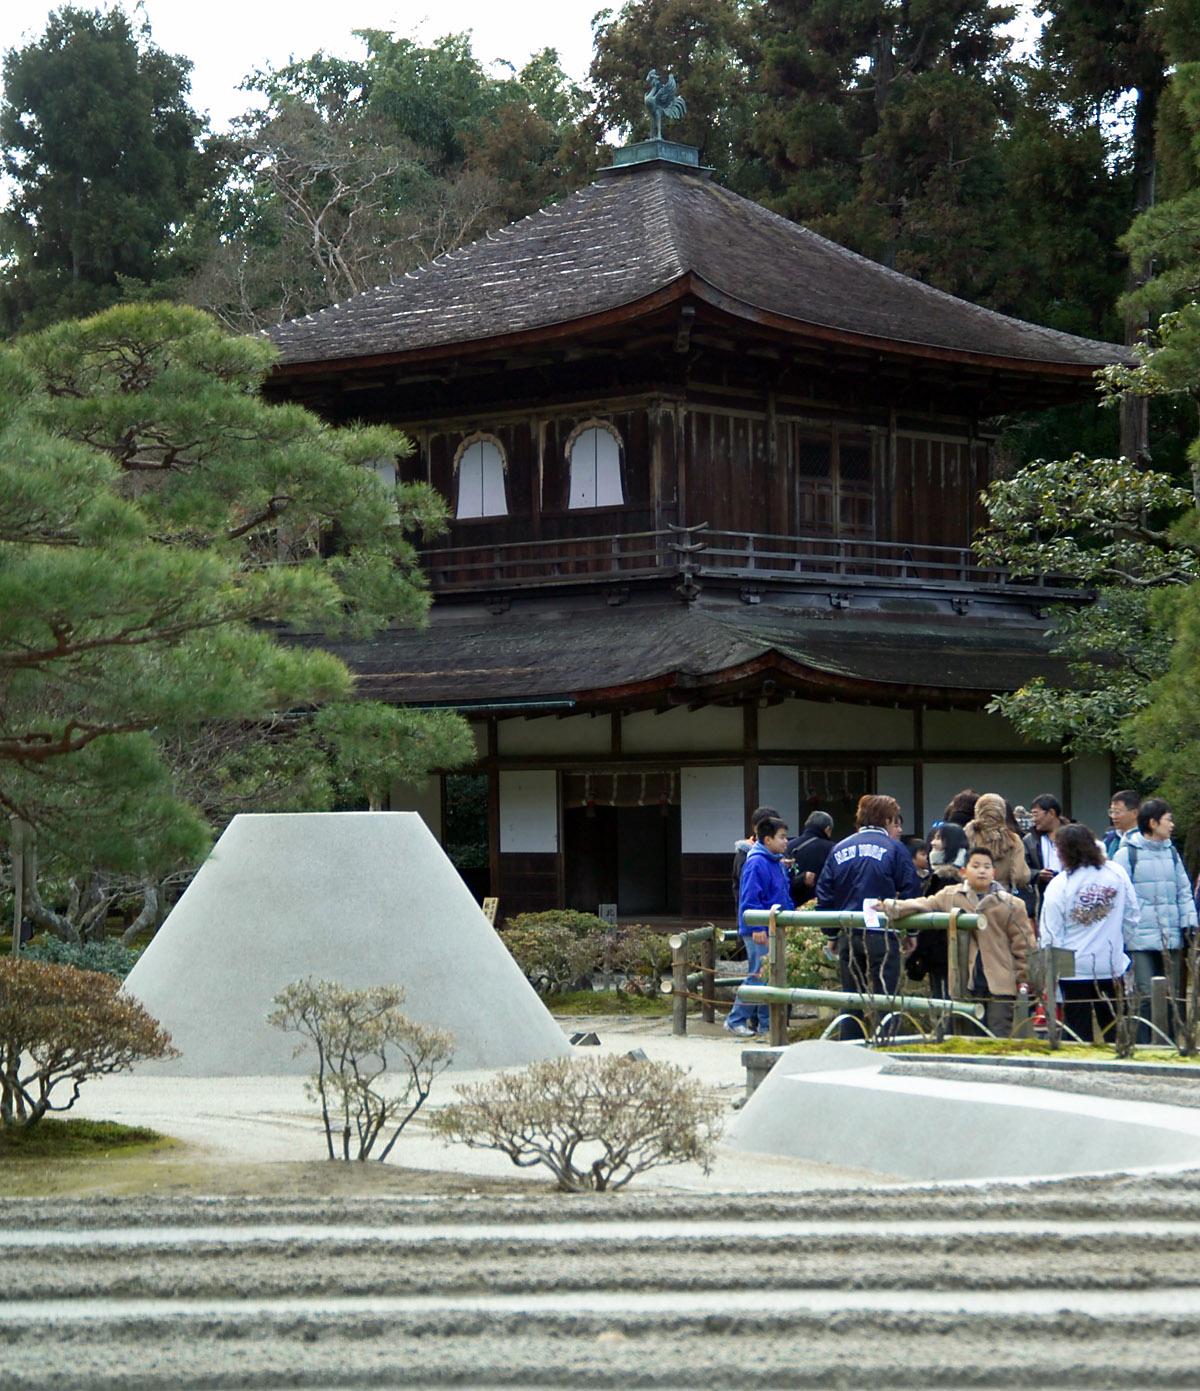 http://upload.wikimedia.org/wikipedia/commons/7/79/Ginkakuji-M1953.jpg